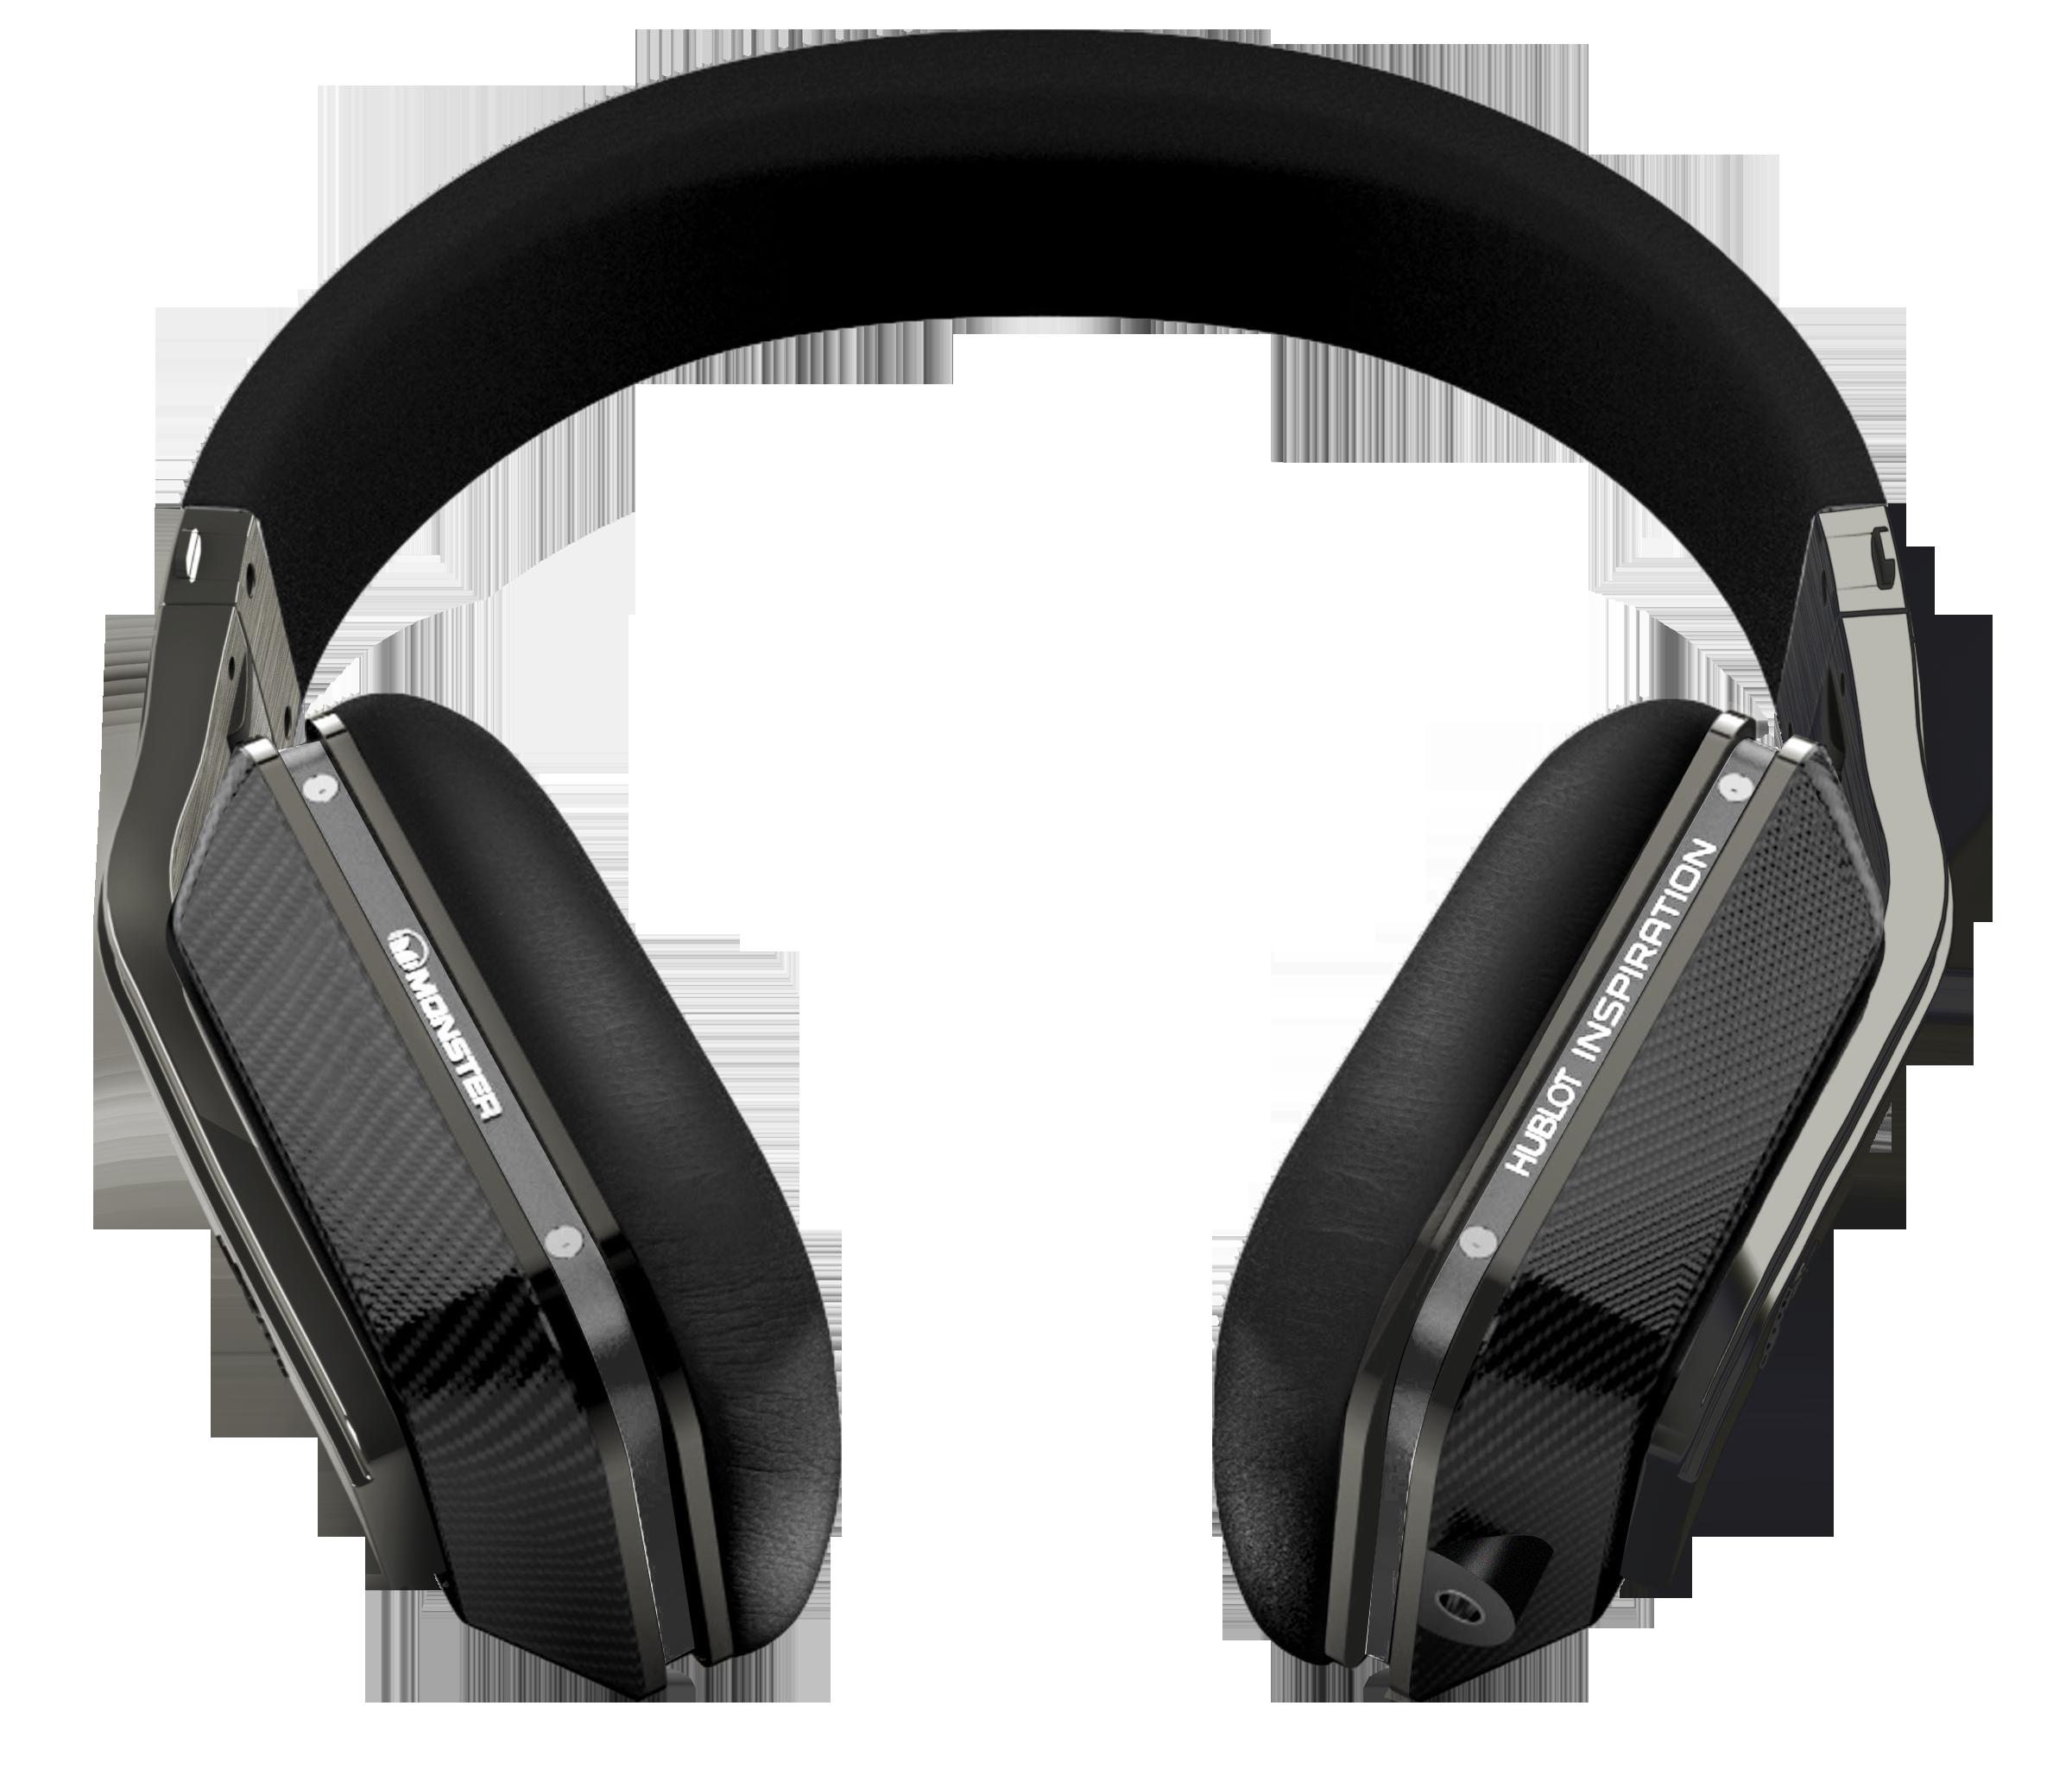 Headphones png images free. Headphone clipart radio headphone